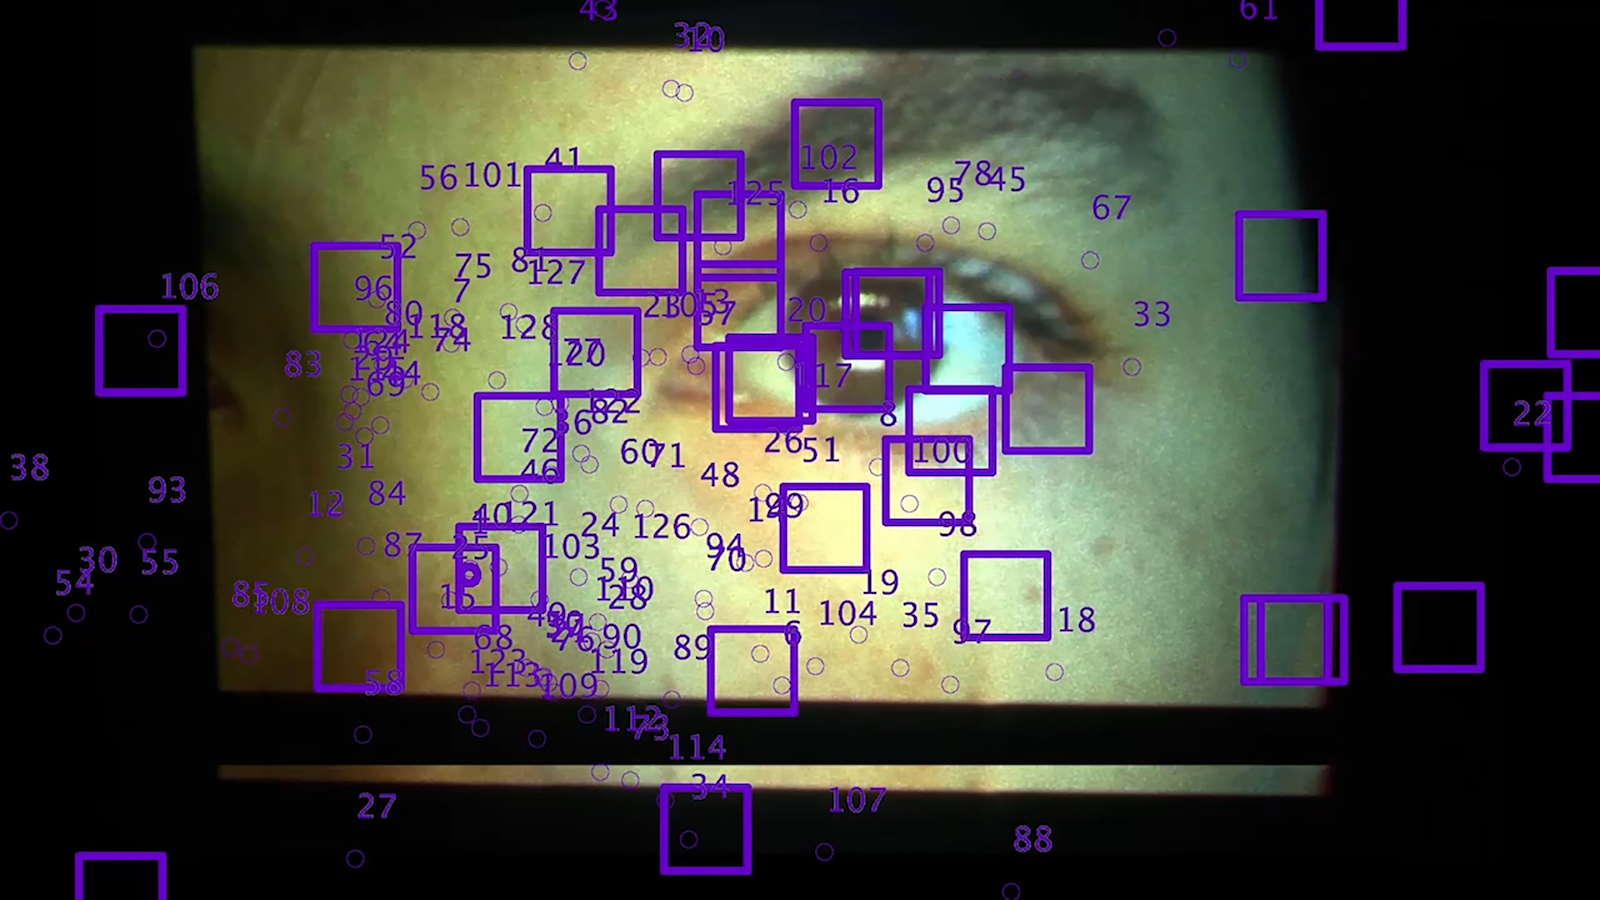 Still image from semi transparent video